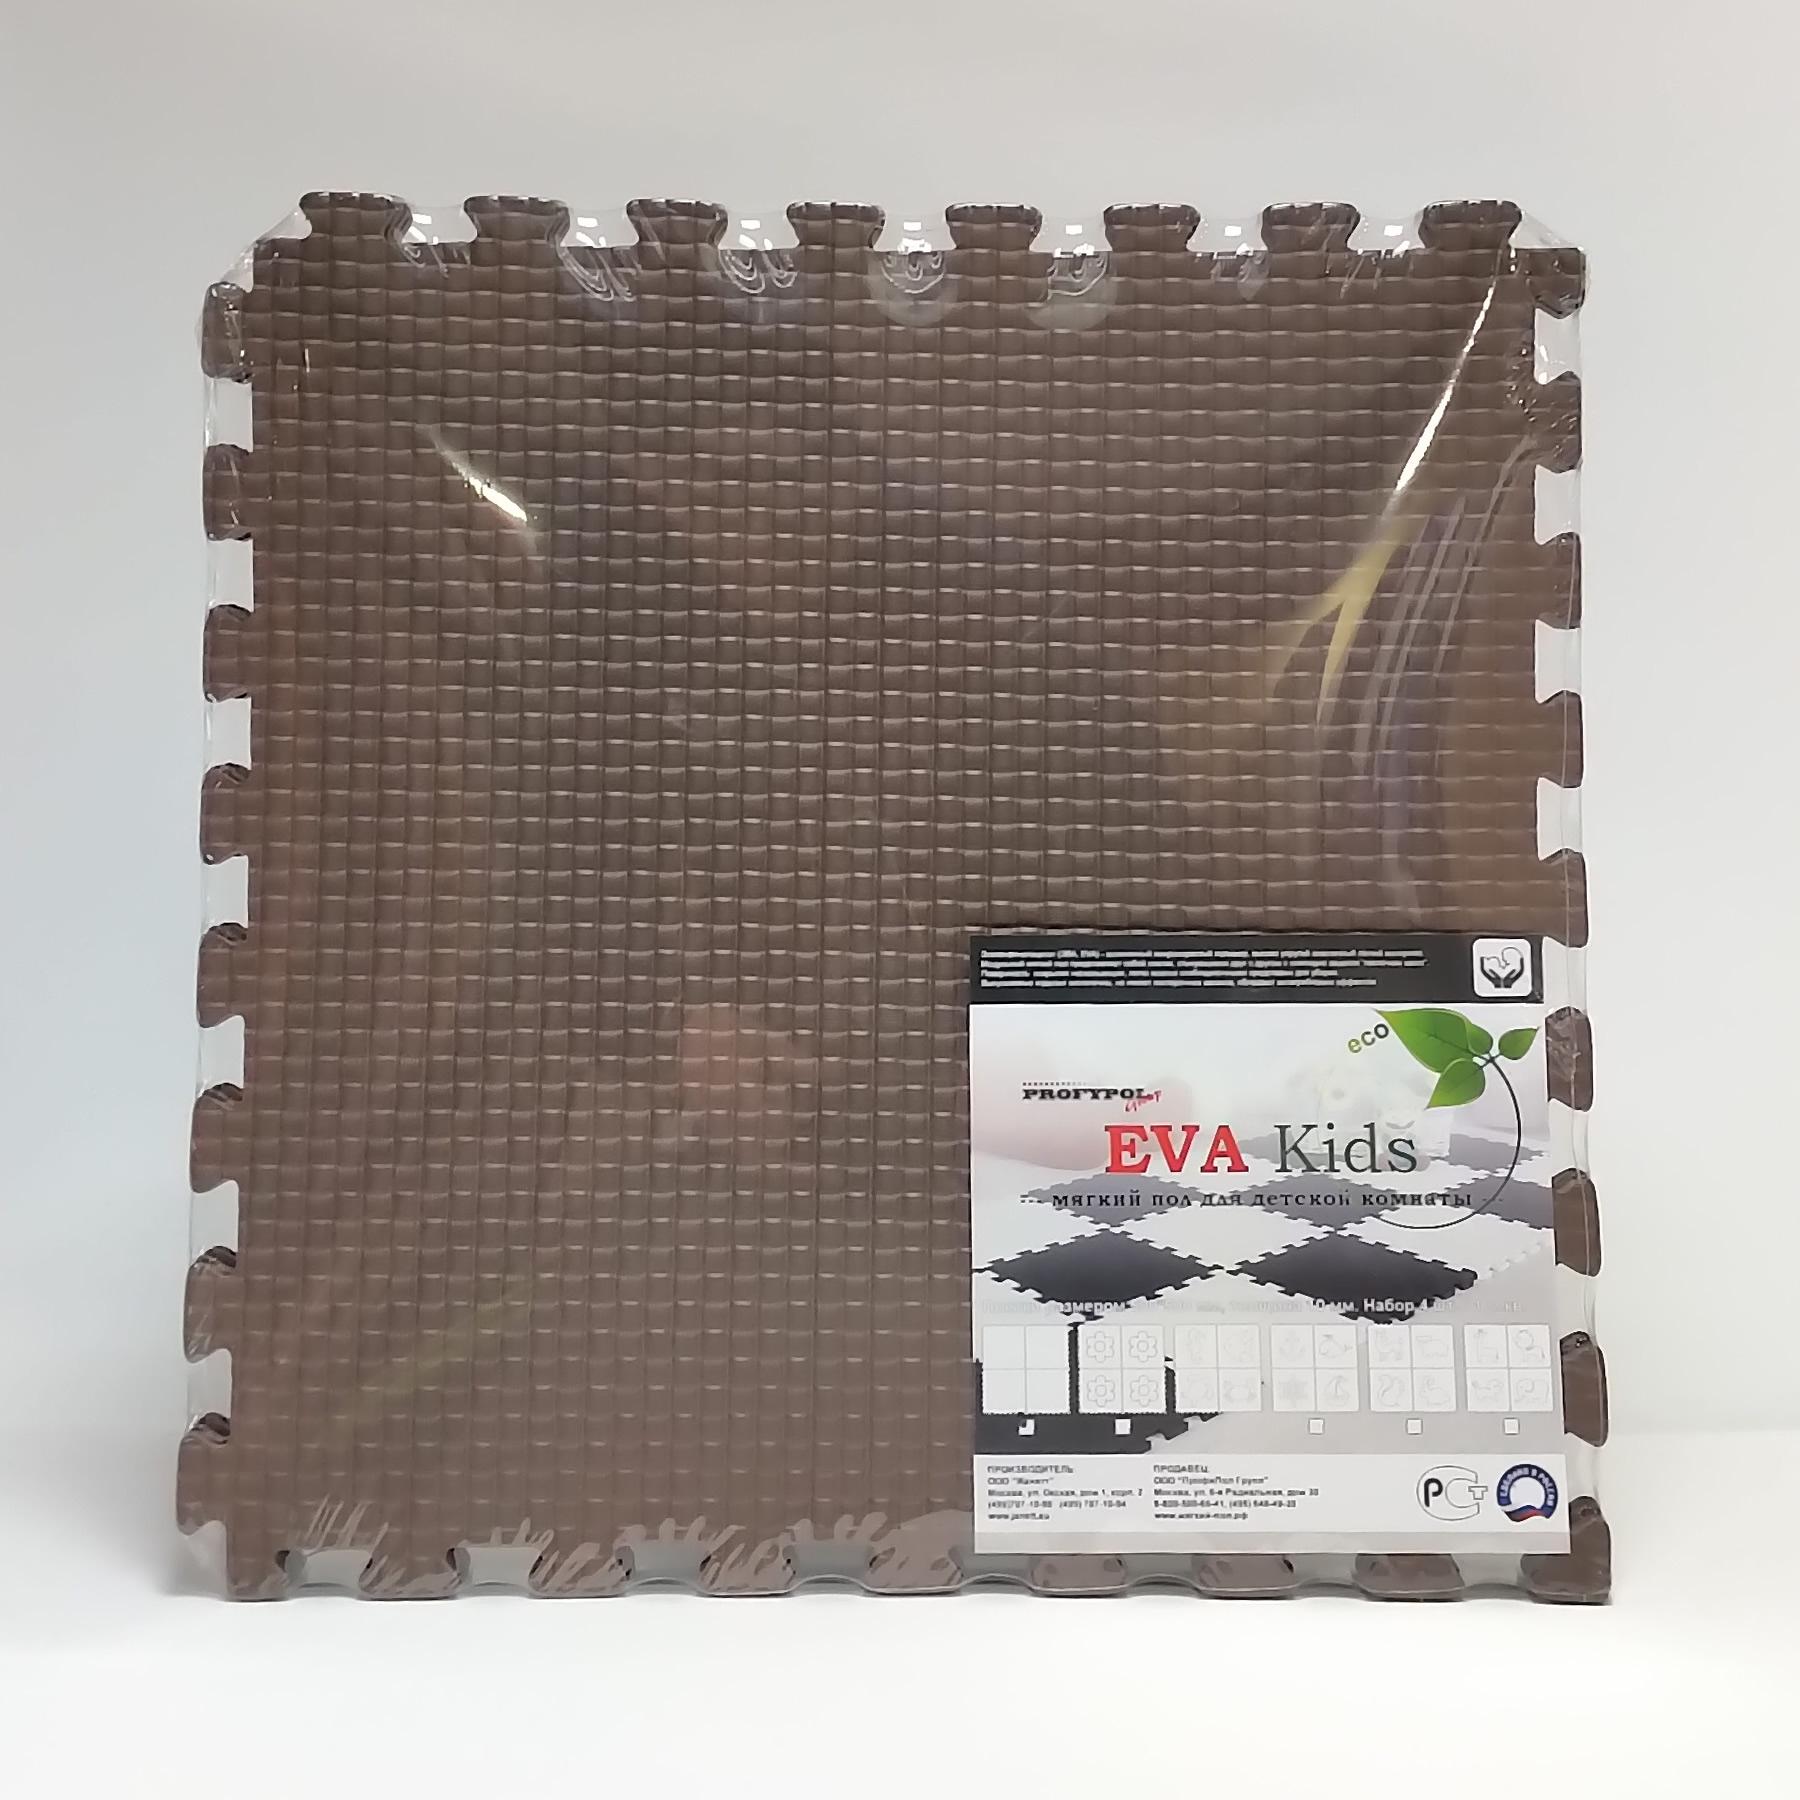 Мягкий пол коврик пазл EvaKids 50х50х1 см набор 4 шт. Коричневый